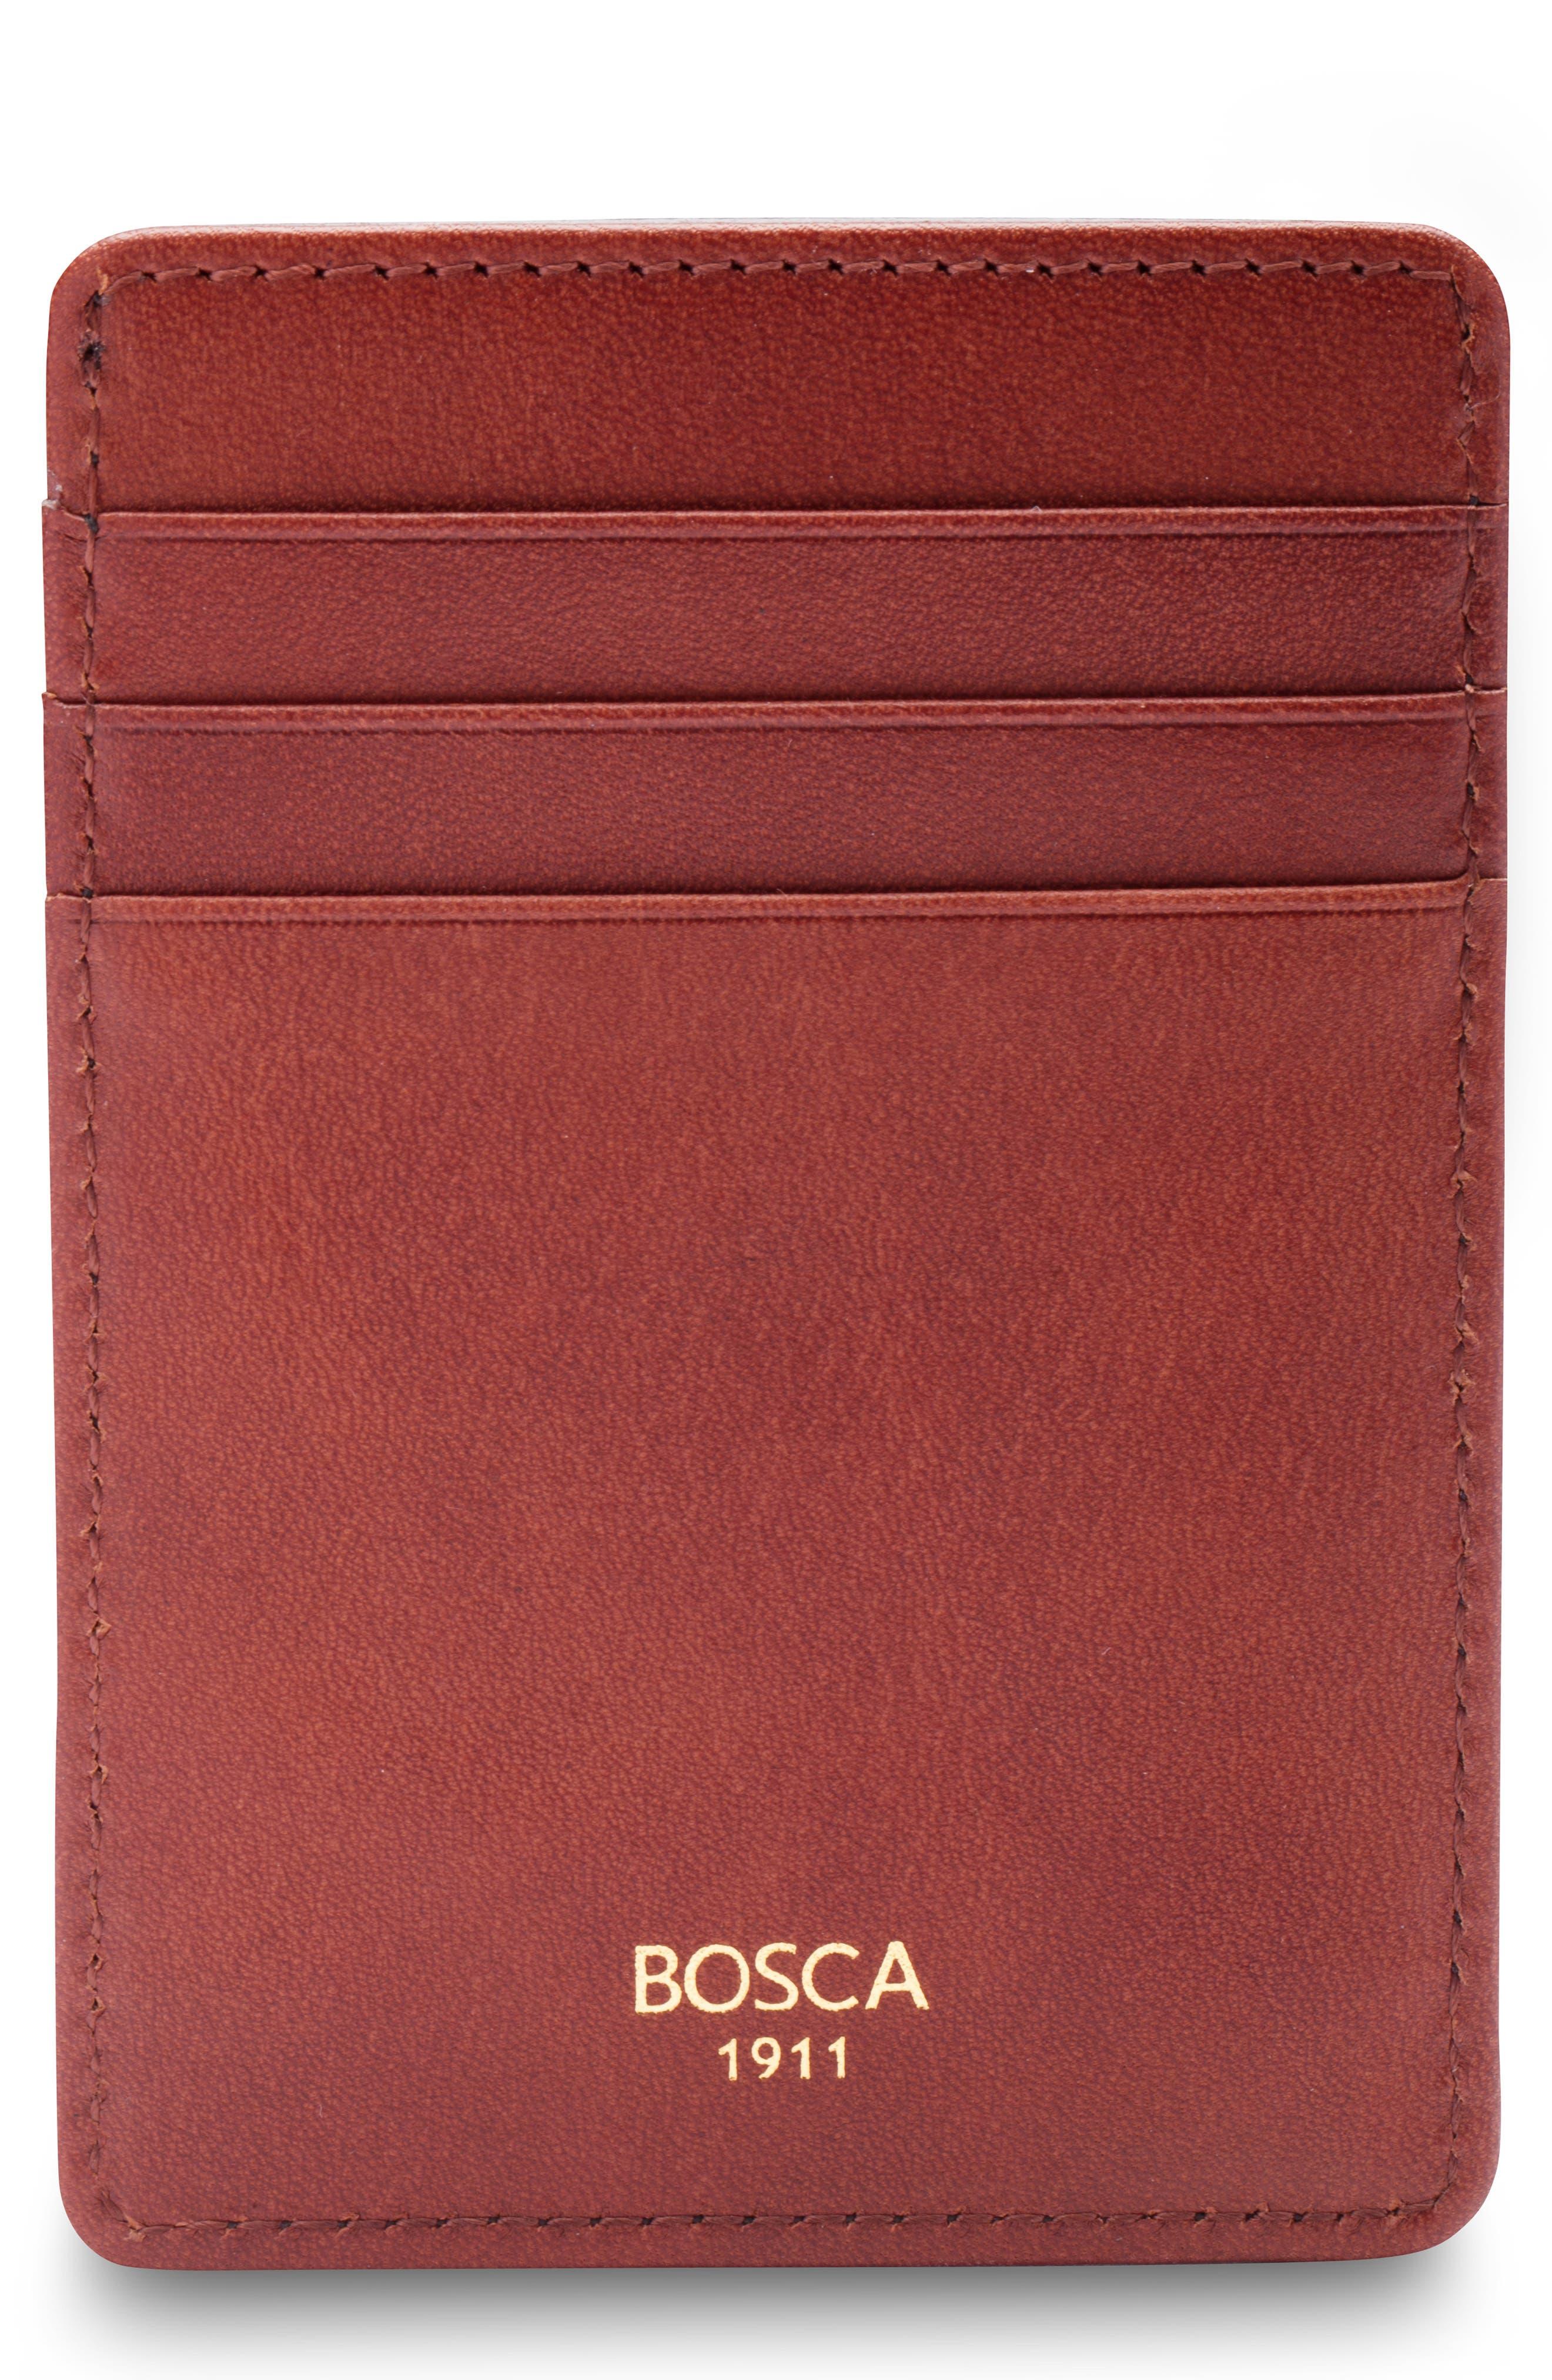 Colorblock Leather Front Pocket Money Clip Wallet